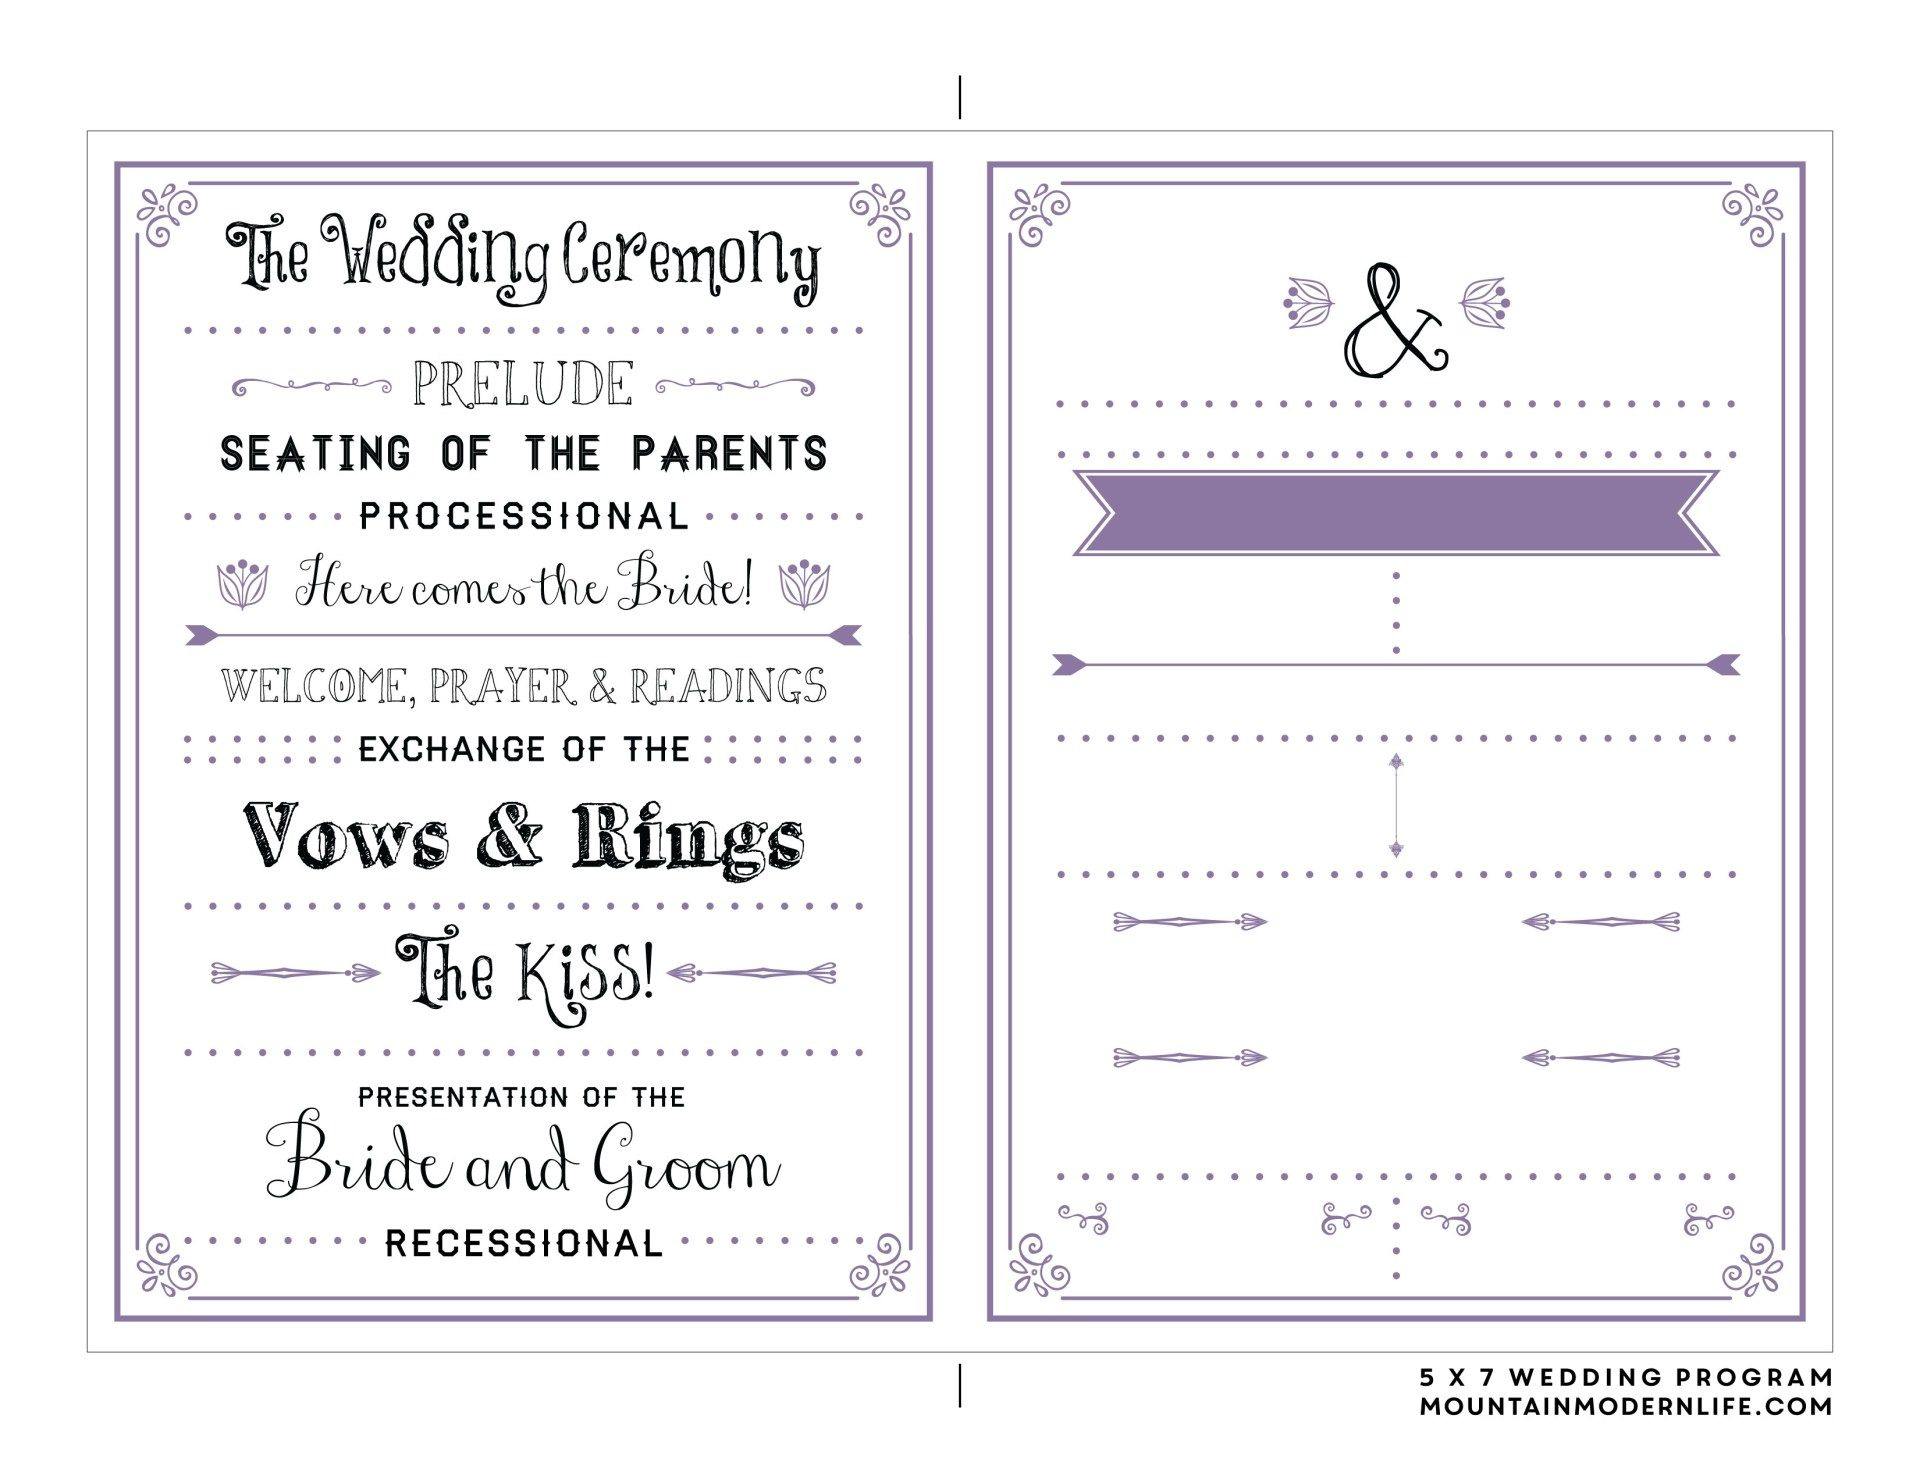 32 Amazing Image Of Free Printable Wedding Invitation Templates Download Denchaihosp Com Wedding Program Template Free Free Wedding Printables Printable Wedding Program Template Free wedding program template downloads